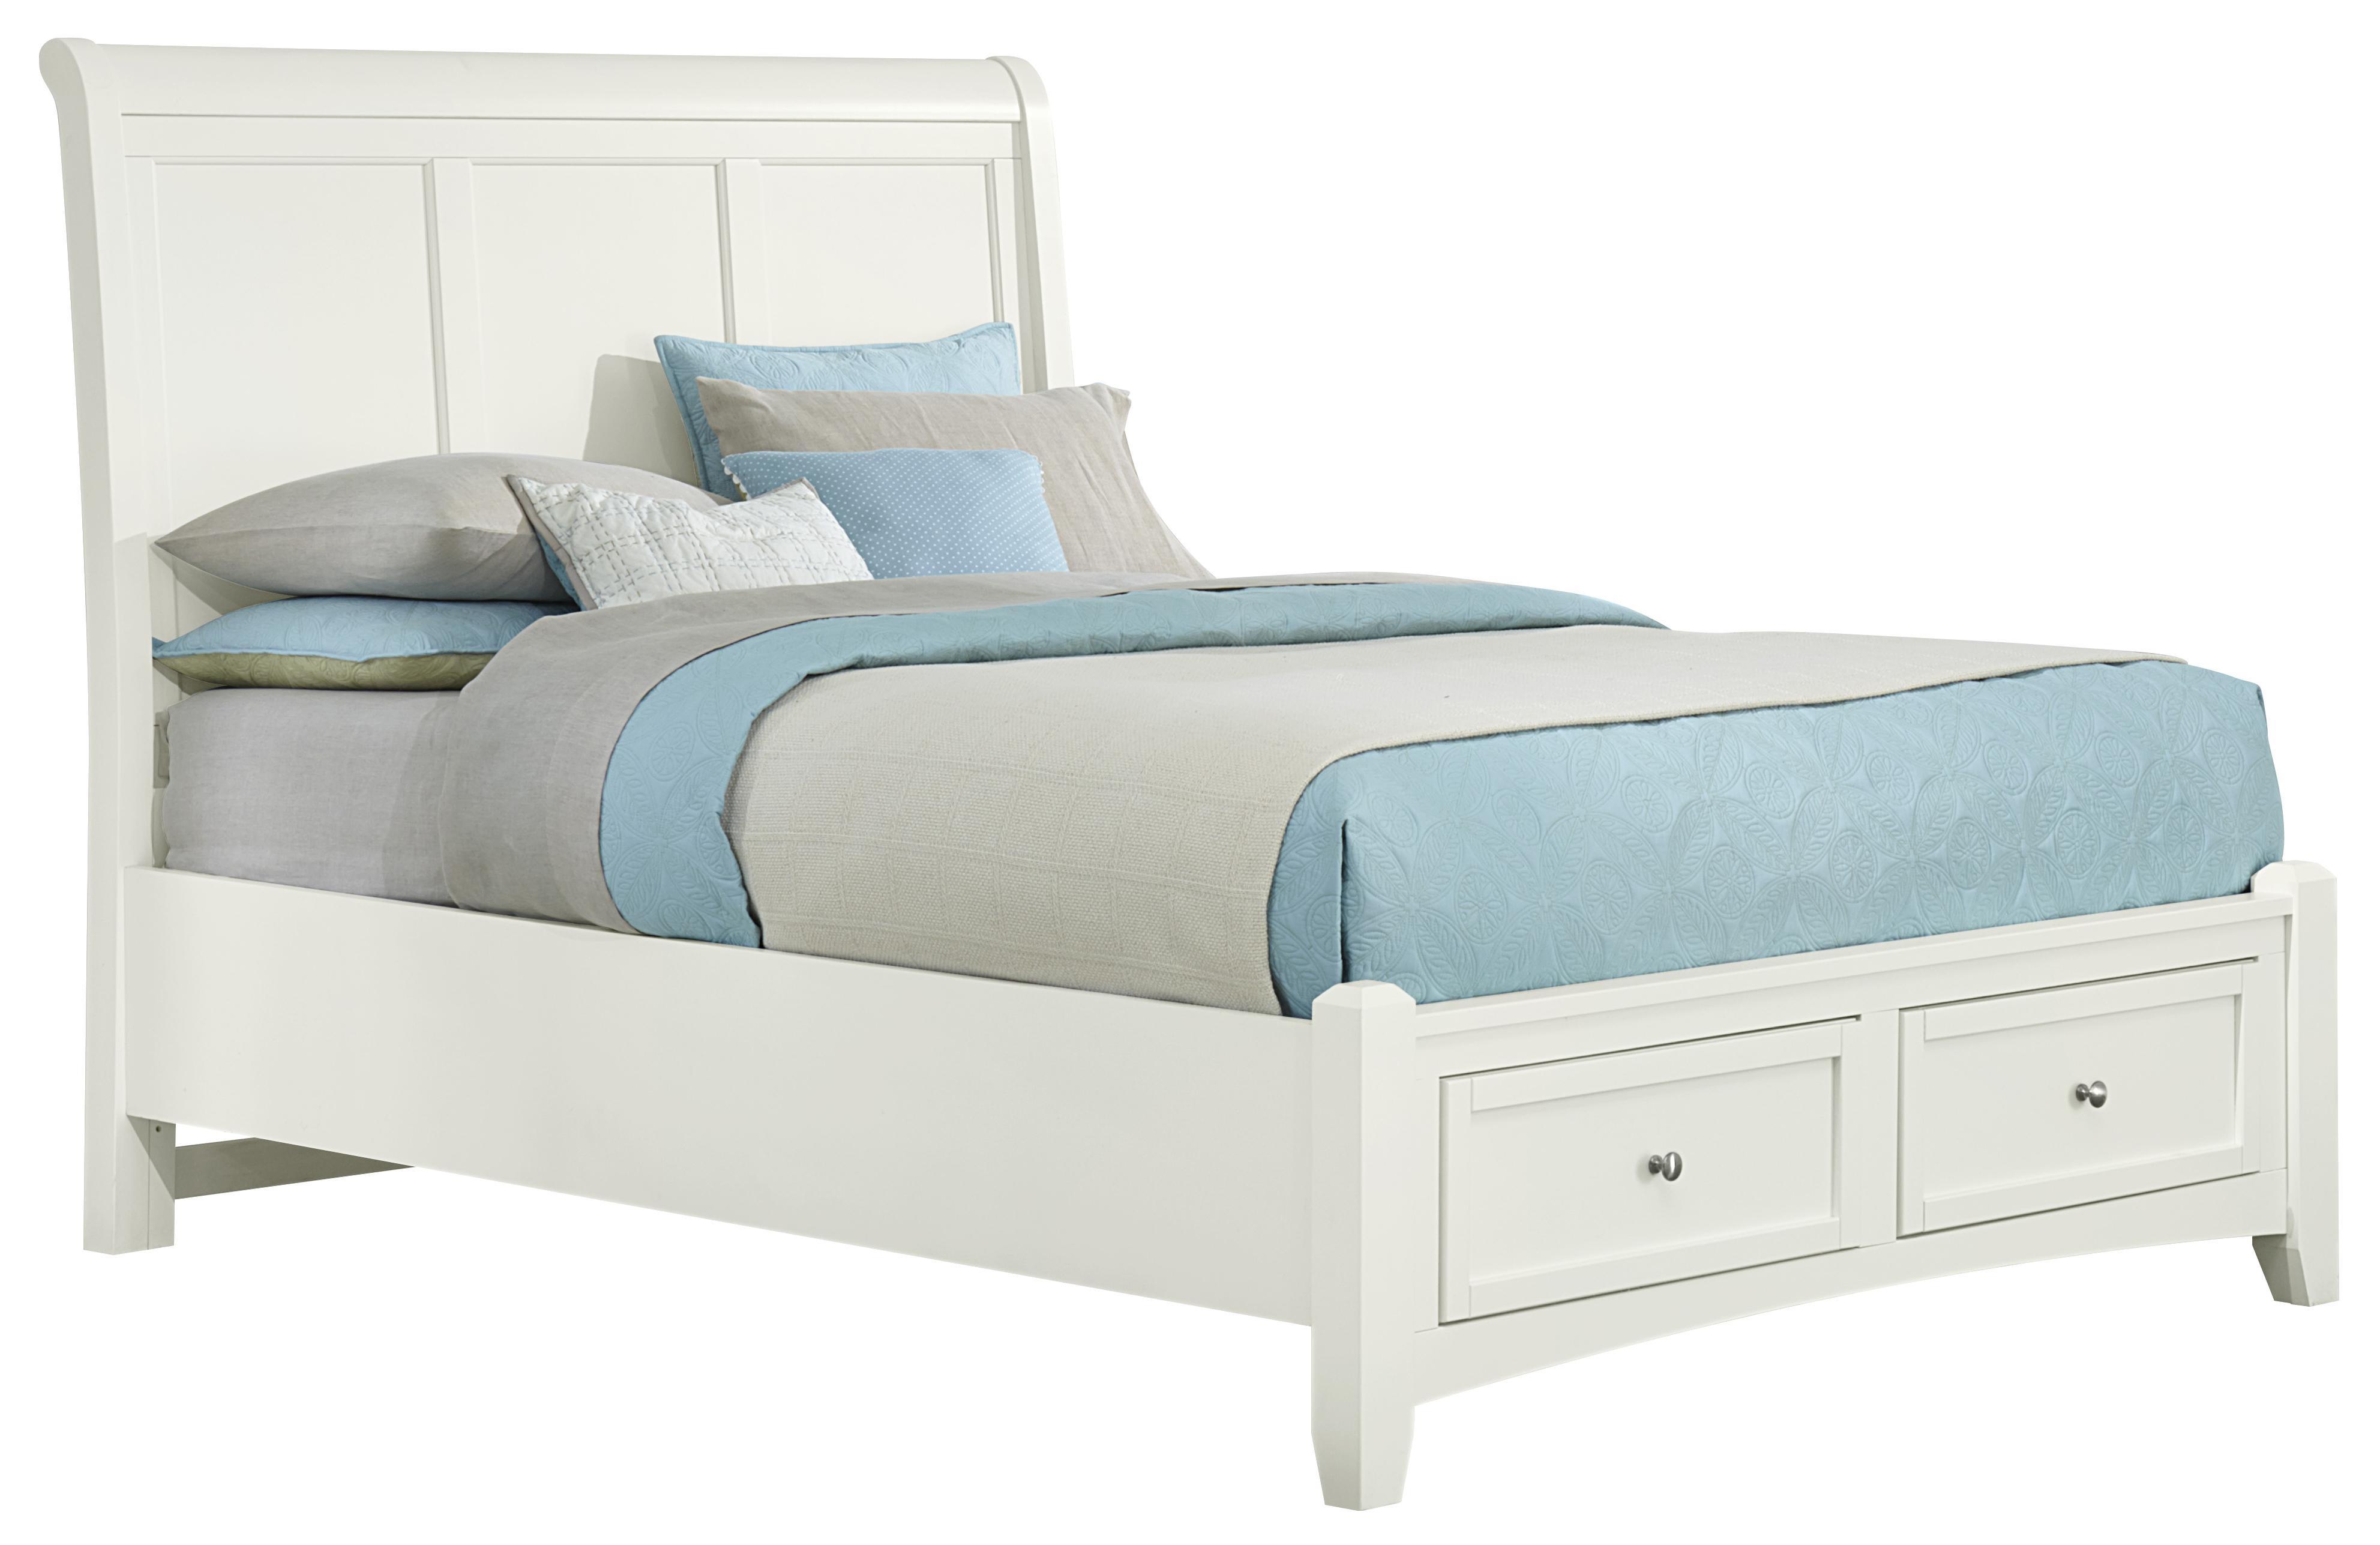 vaughan bassett bonanza full sleigh storage bed with 2 drawers belfort furniture platform. Black Bedroom Furniture Sets. Home Design Ideas